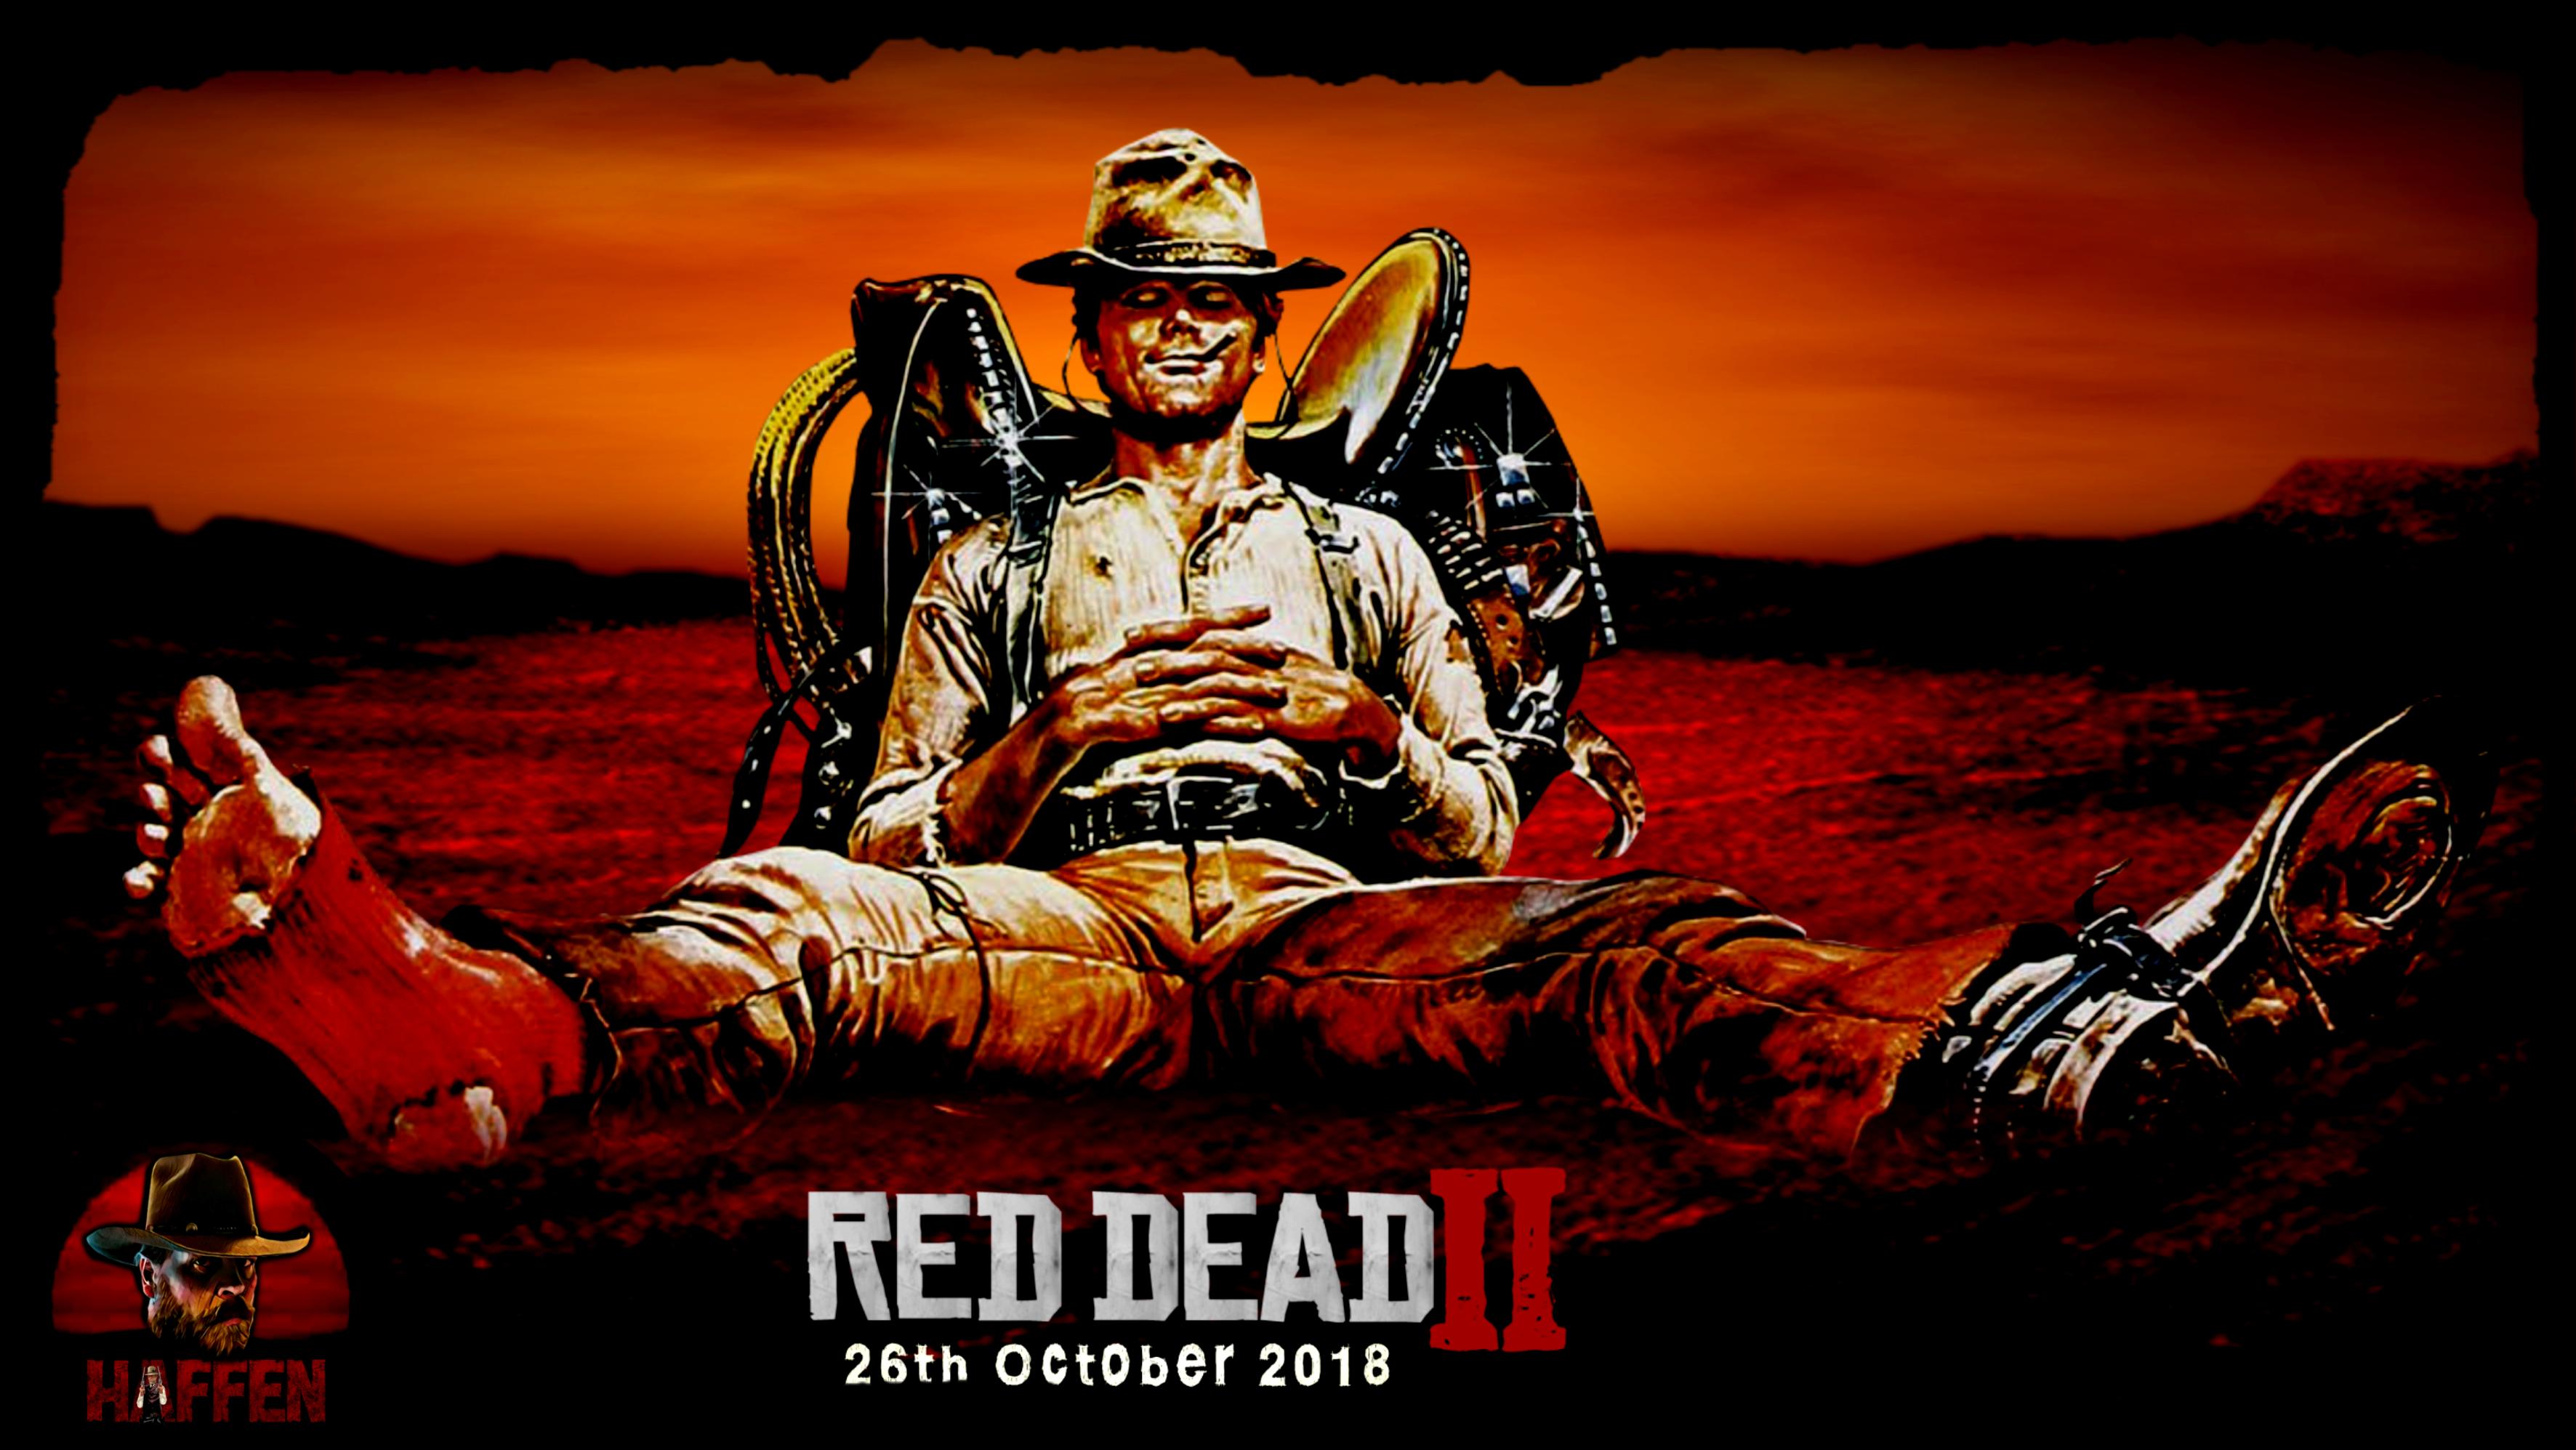 Rdr2 8 Months To 26th October 2018 Fan Art By Haffen Red Dead Redemption Artwork Red Dead Redemption Ii Red Dead Redemption